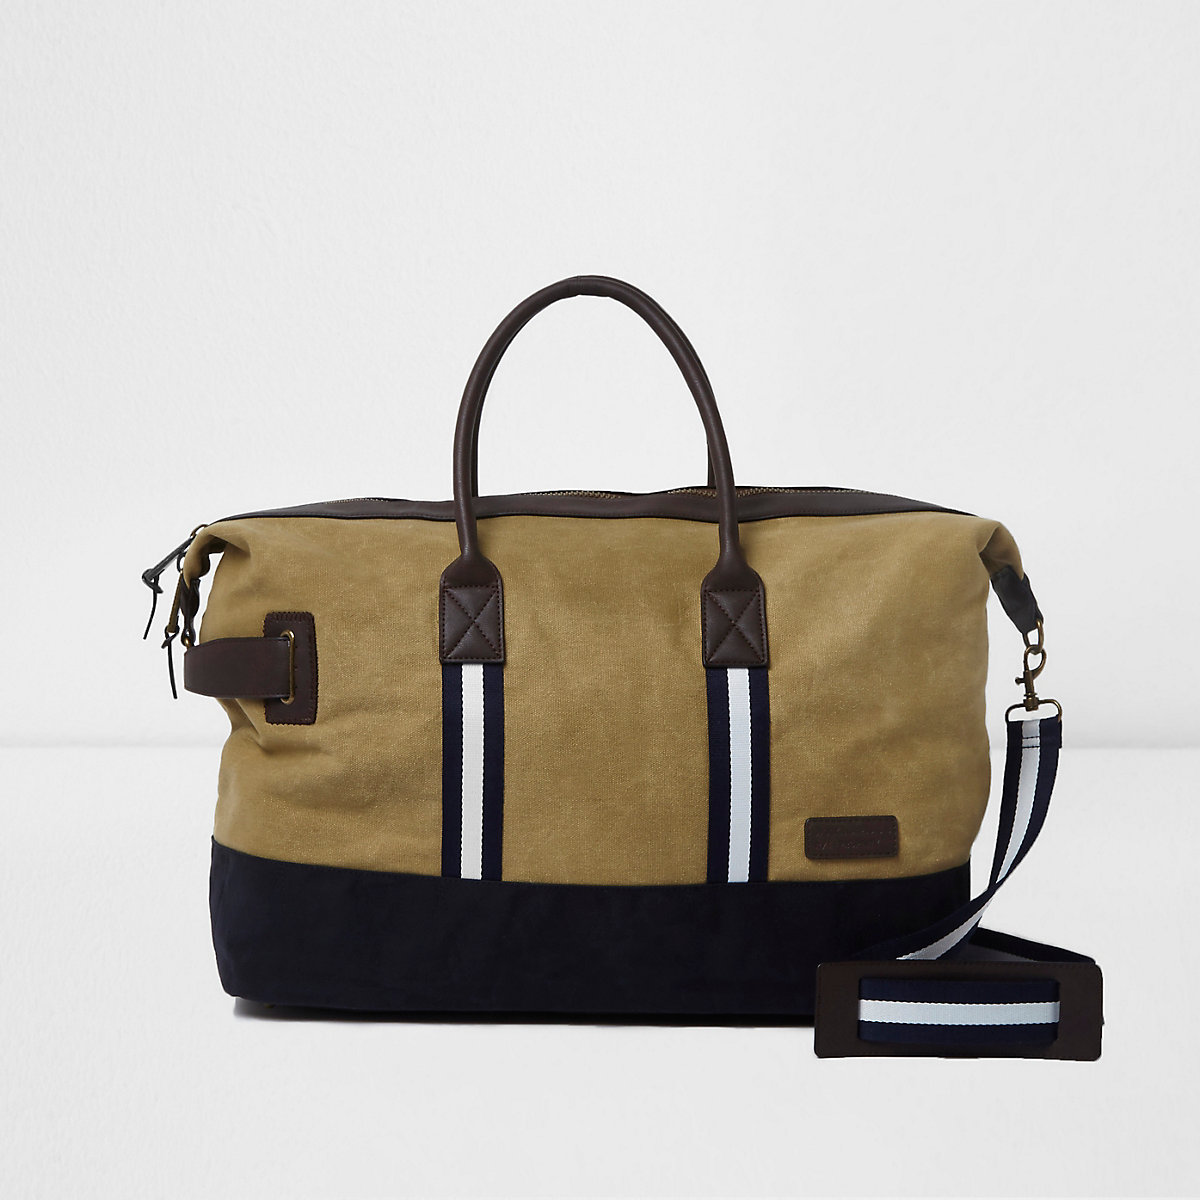 Khaki canvas holdall bag